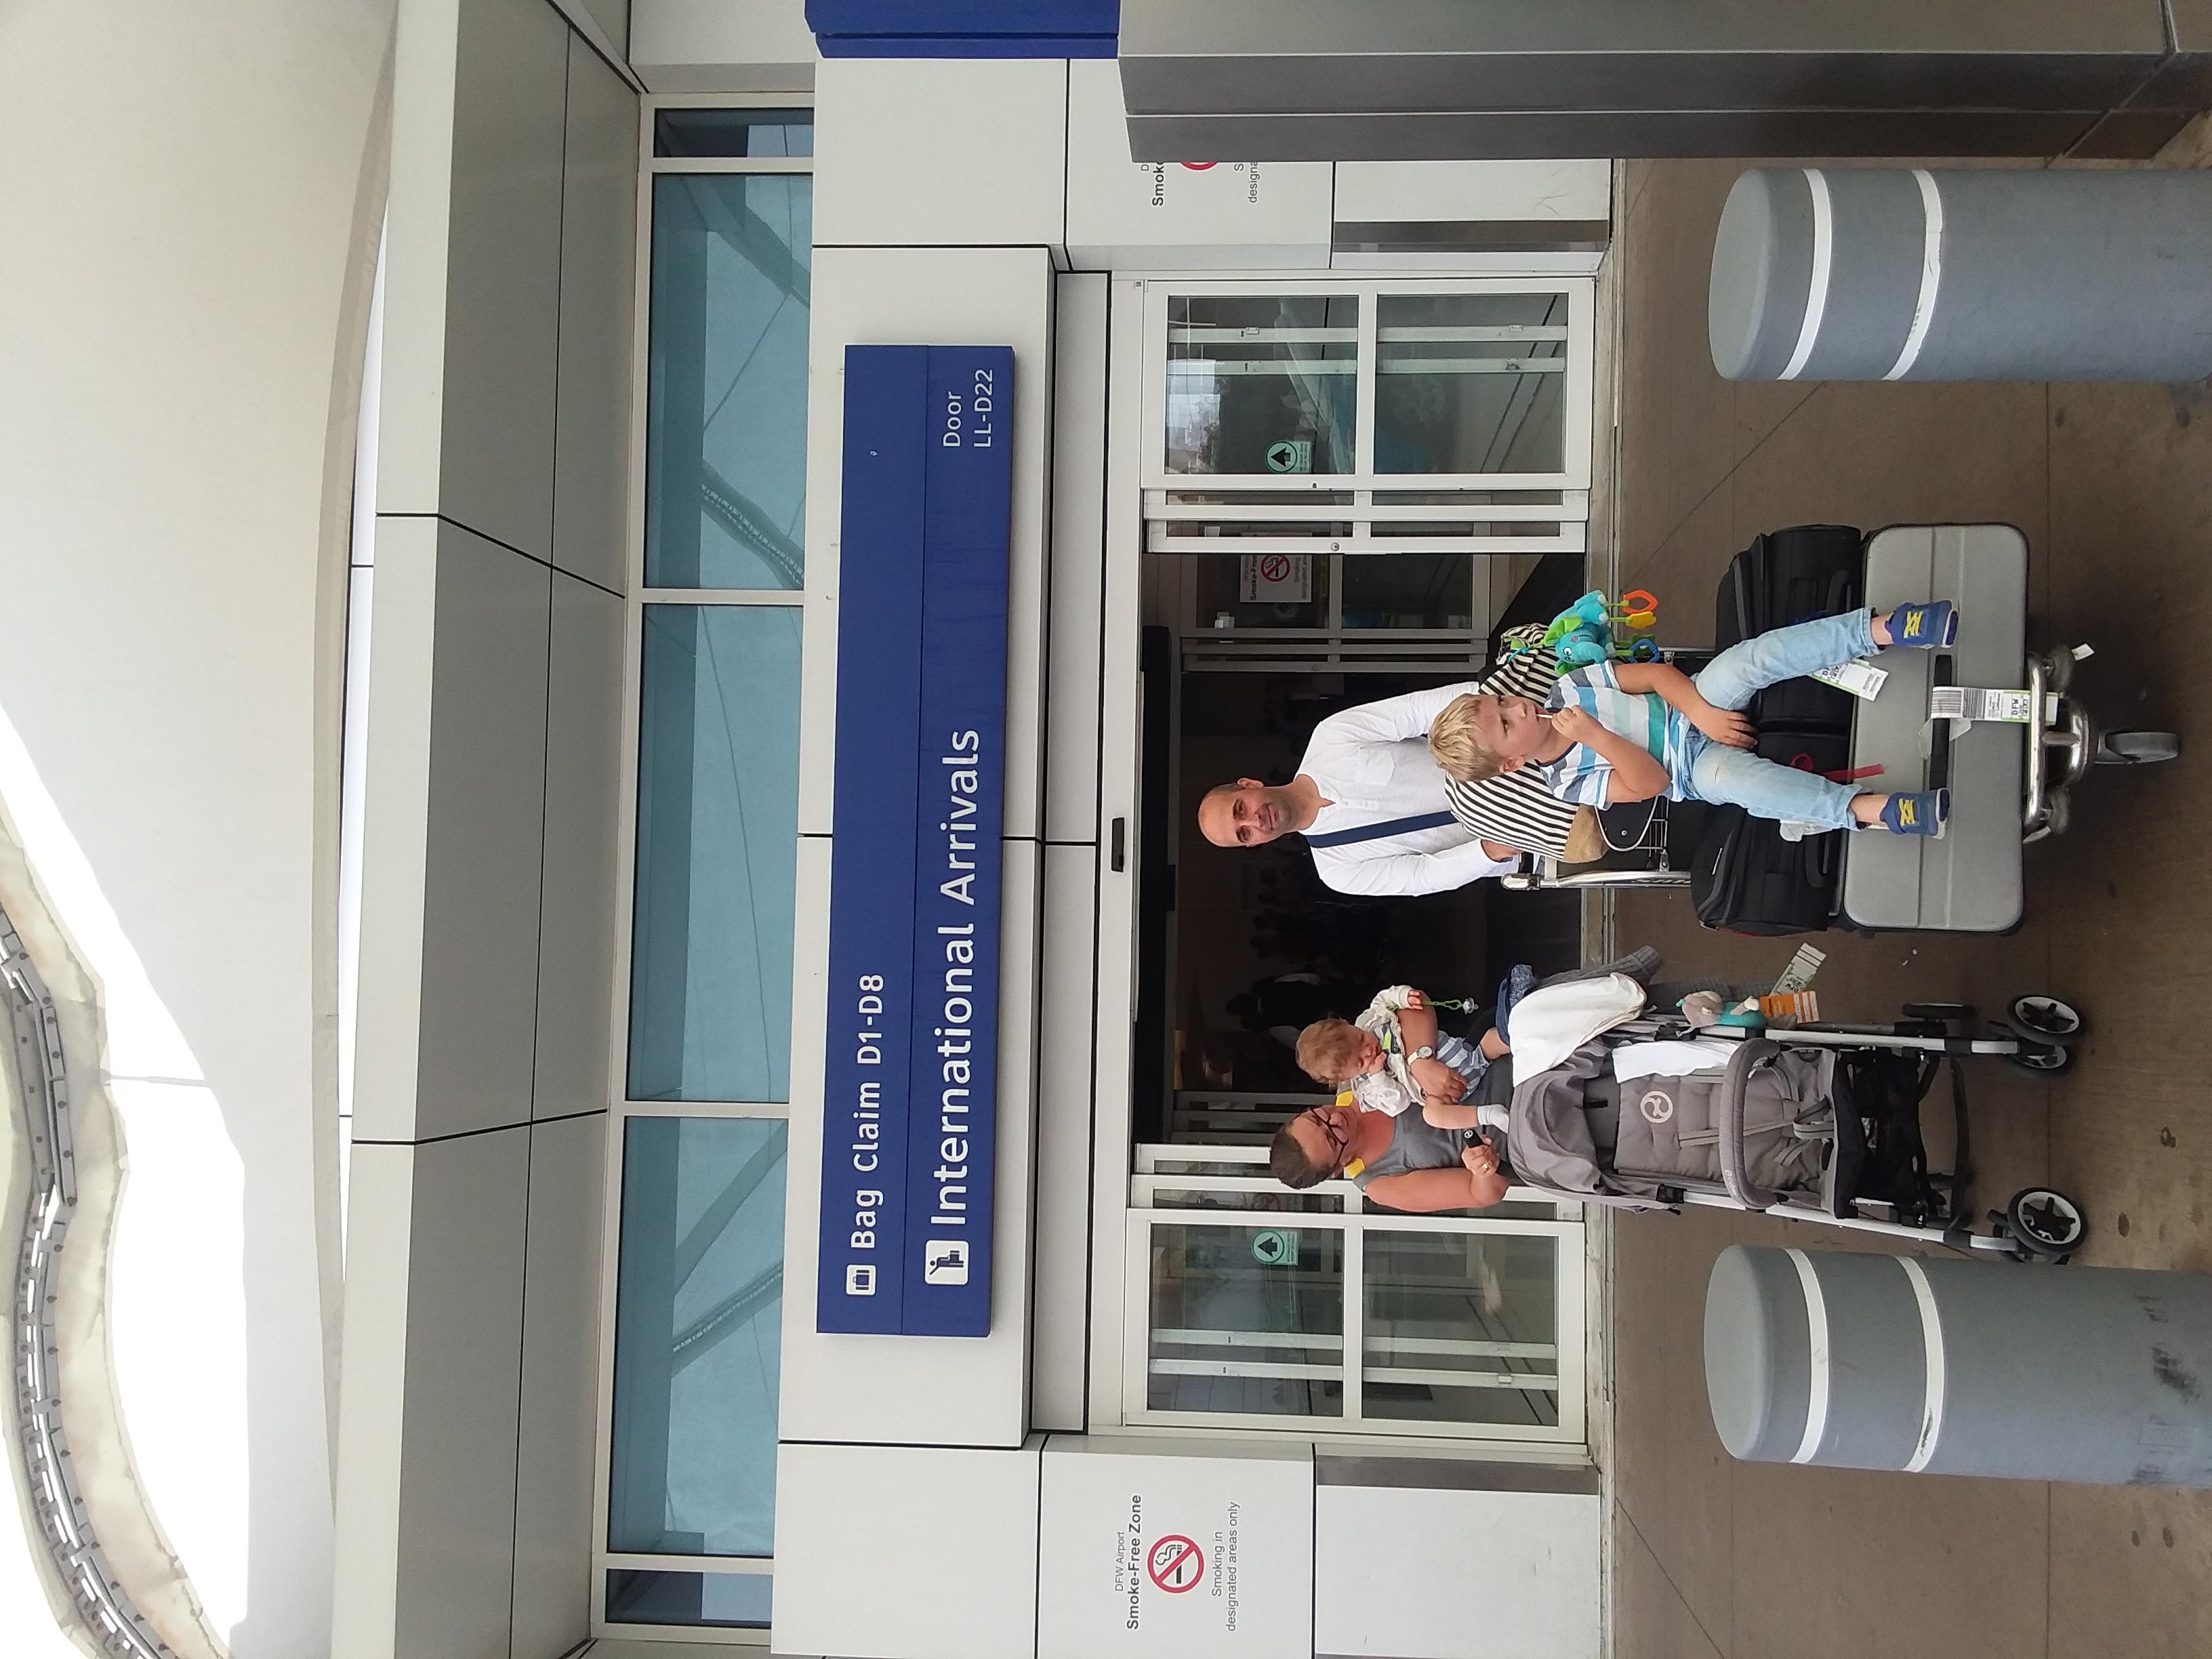 DFW Airport - Adam Kerner family arrived_